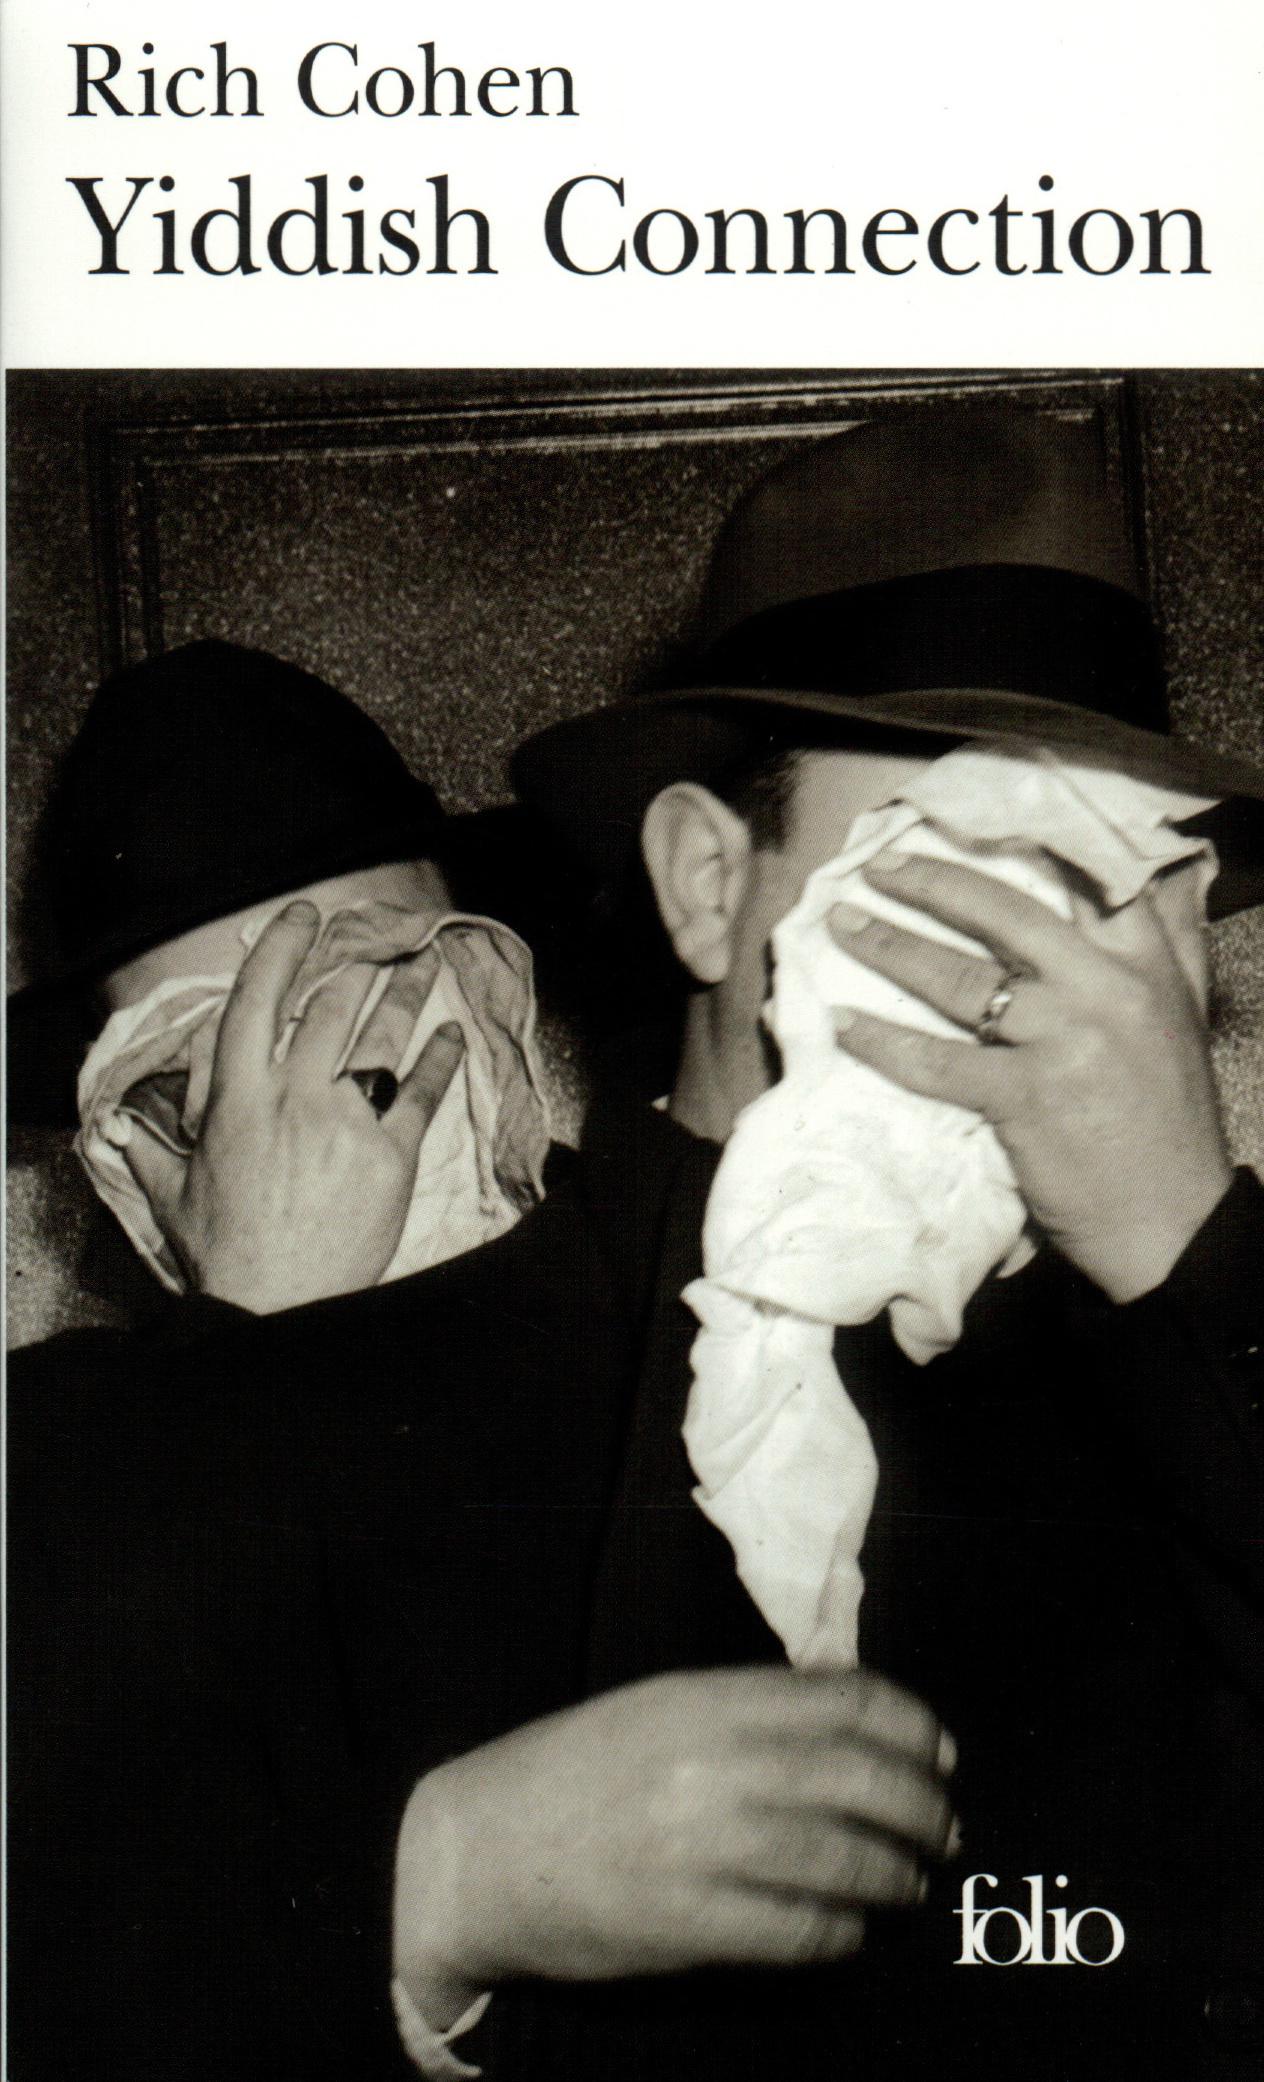 YIDDISH CONNECTION HISTOIRES VRAIES DES GANGSTERS JUIFS AMERICAINS